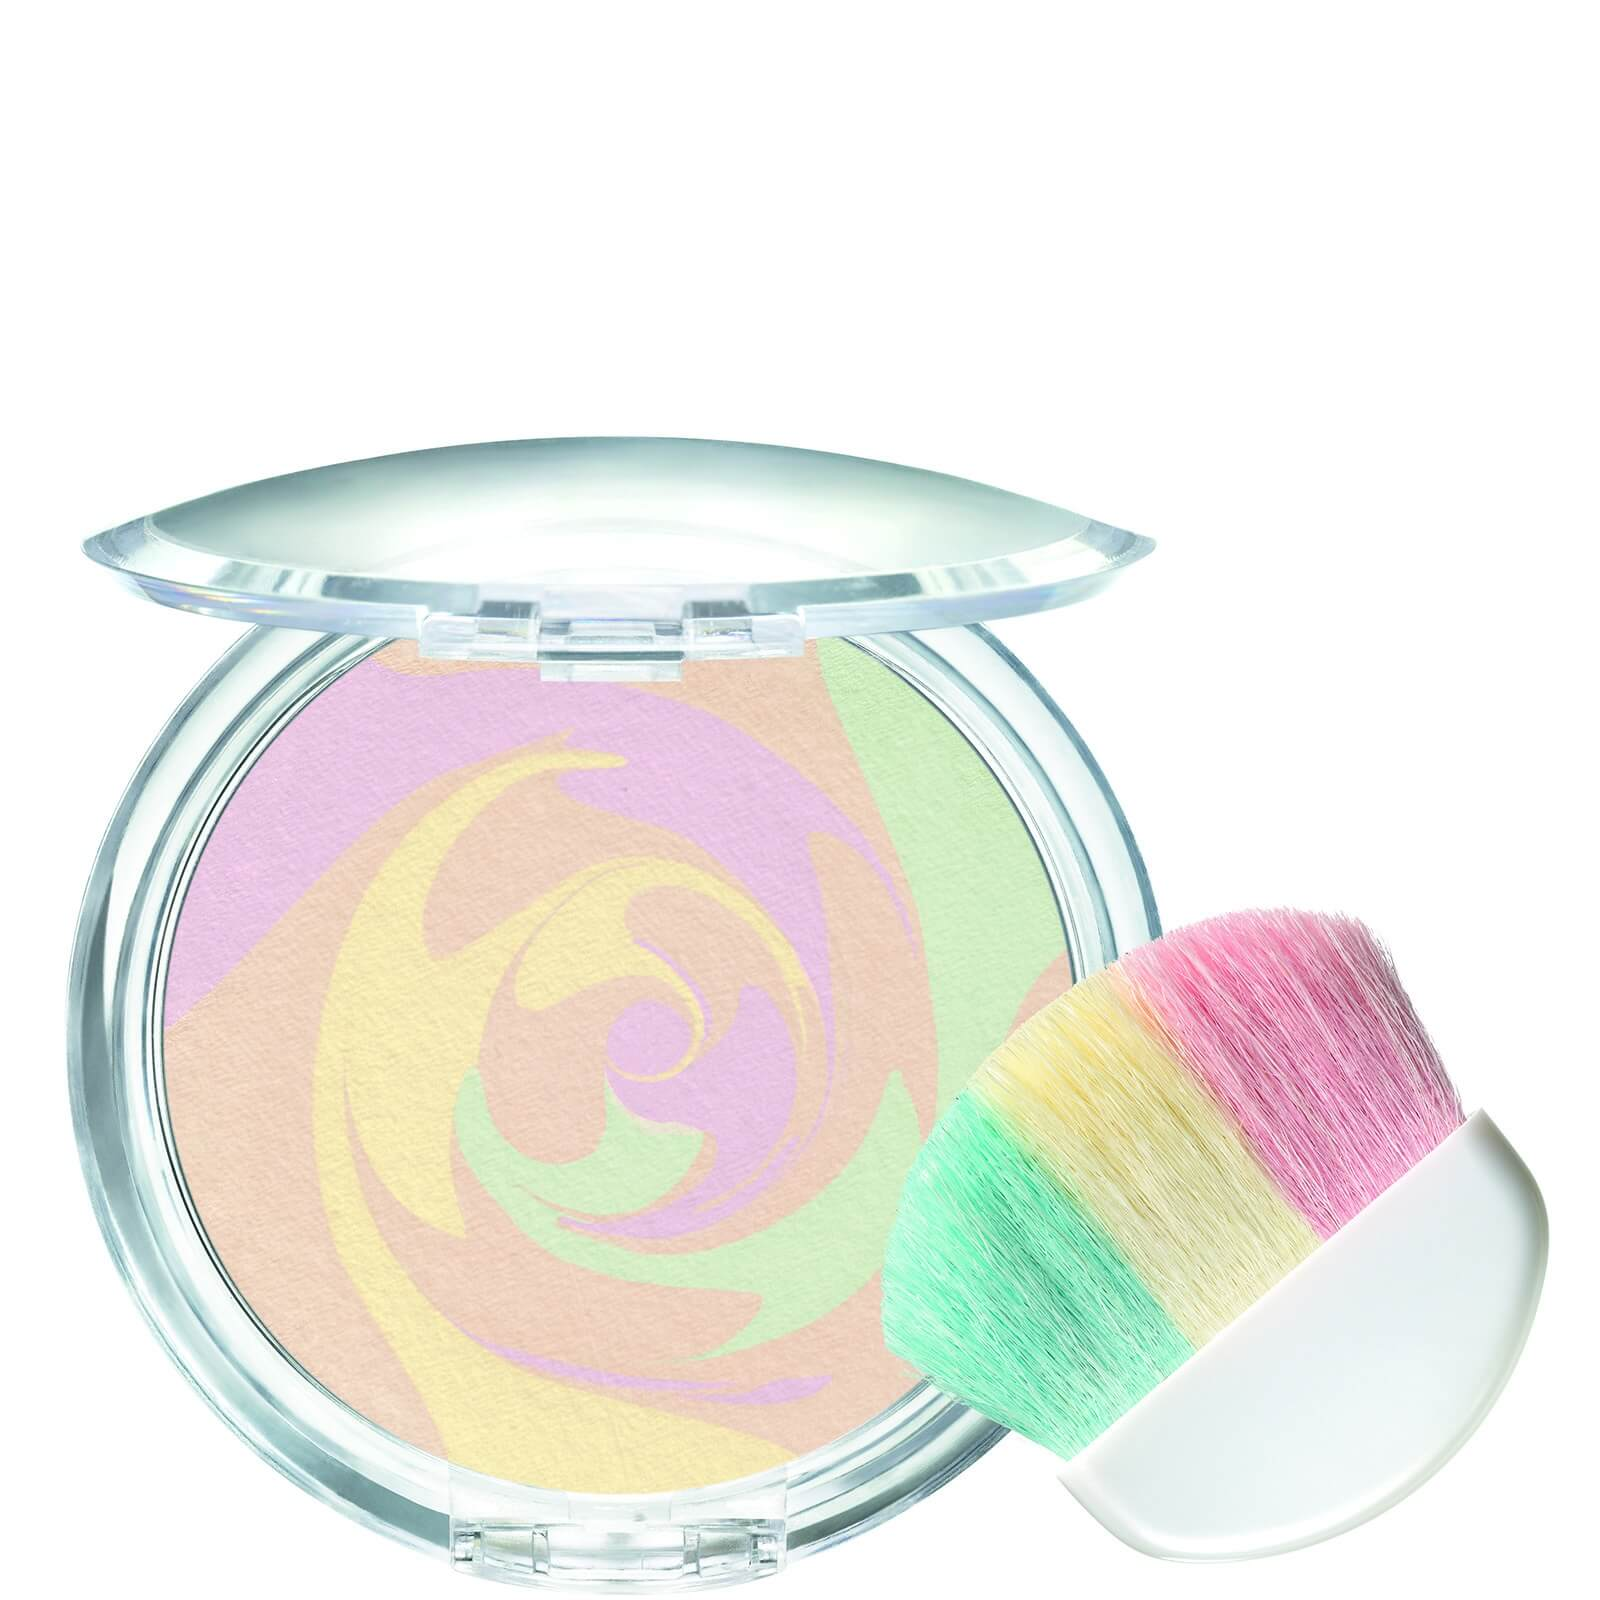 Physicians Formula Mineral Wear Talc-Free Mineral Correcting Powder Translucent